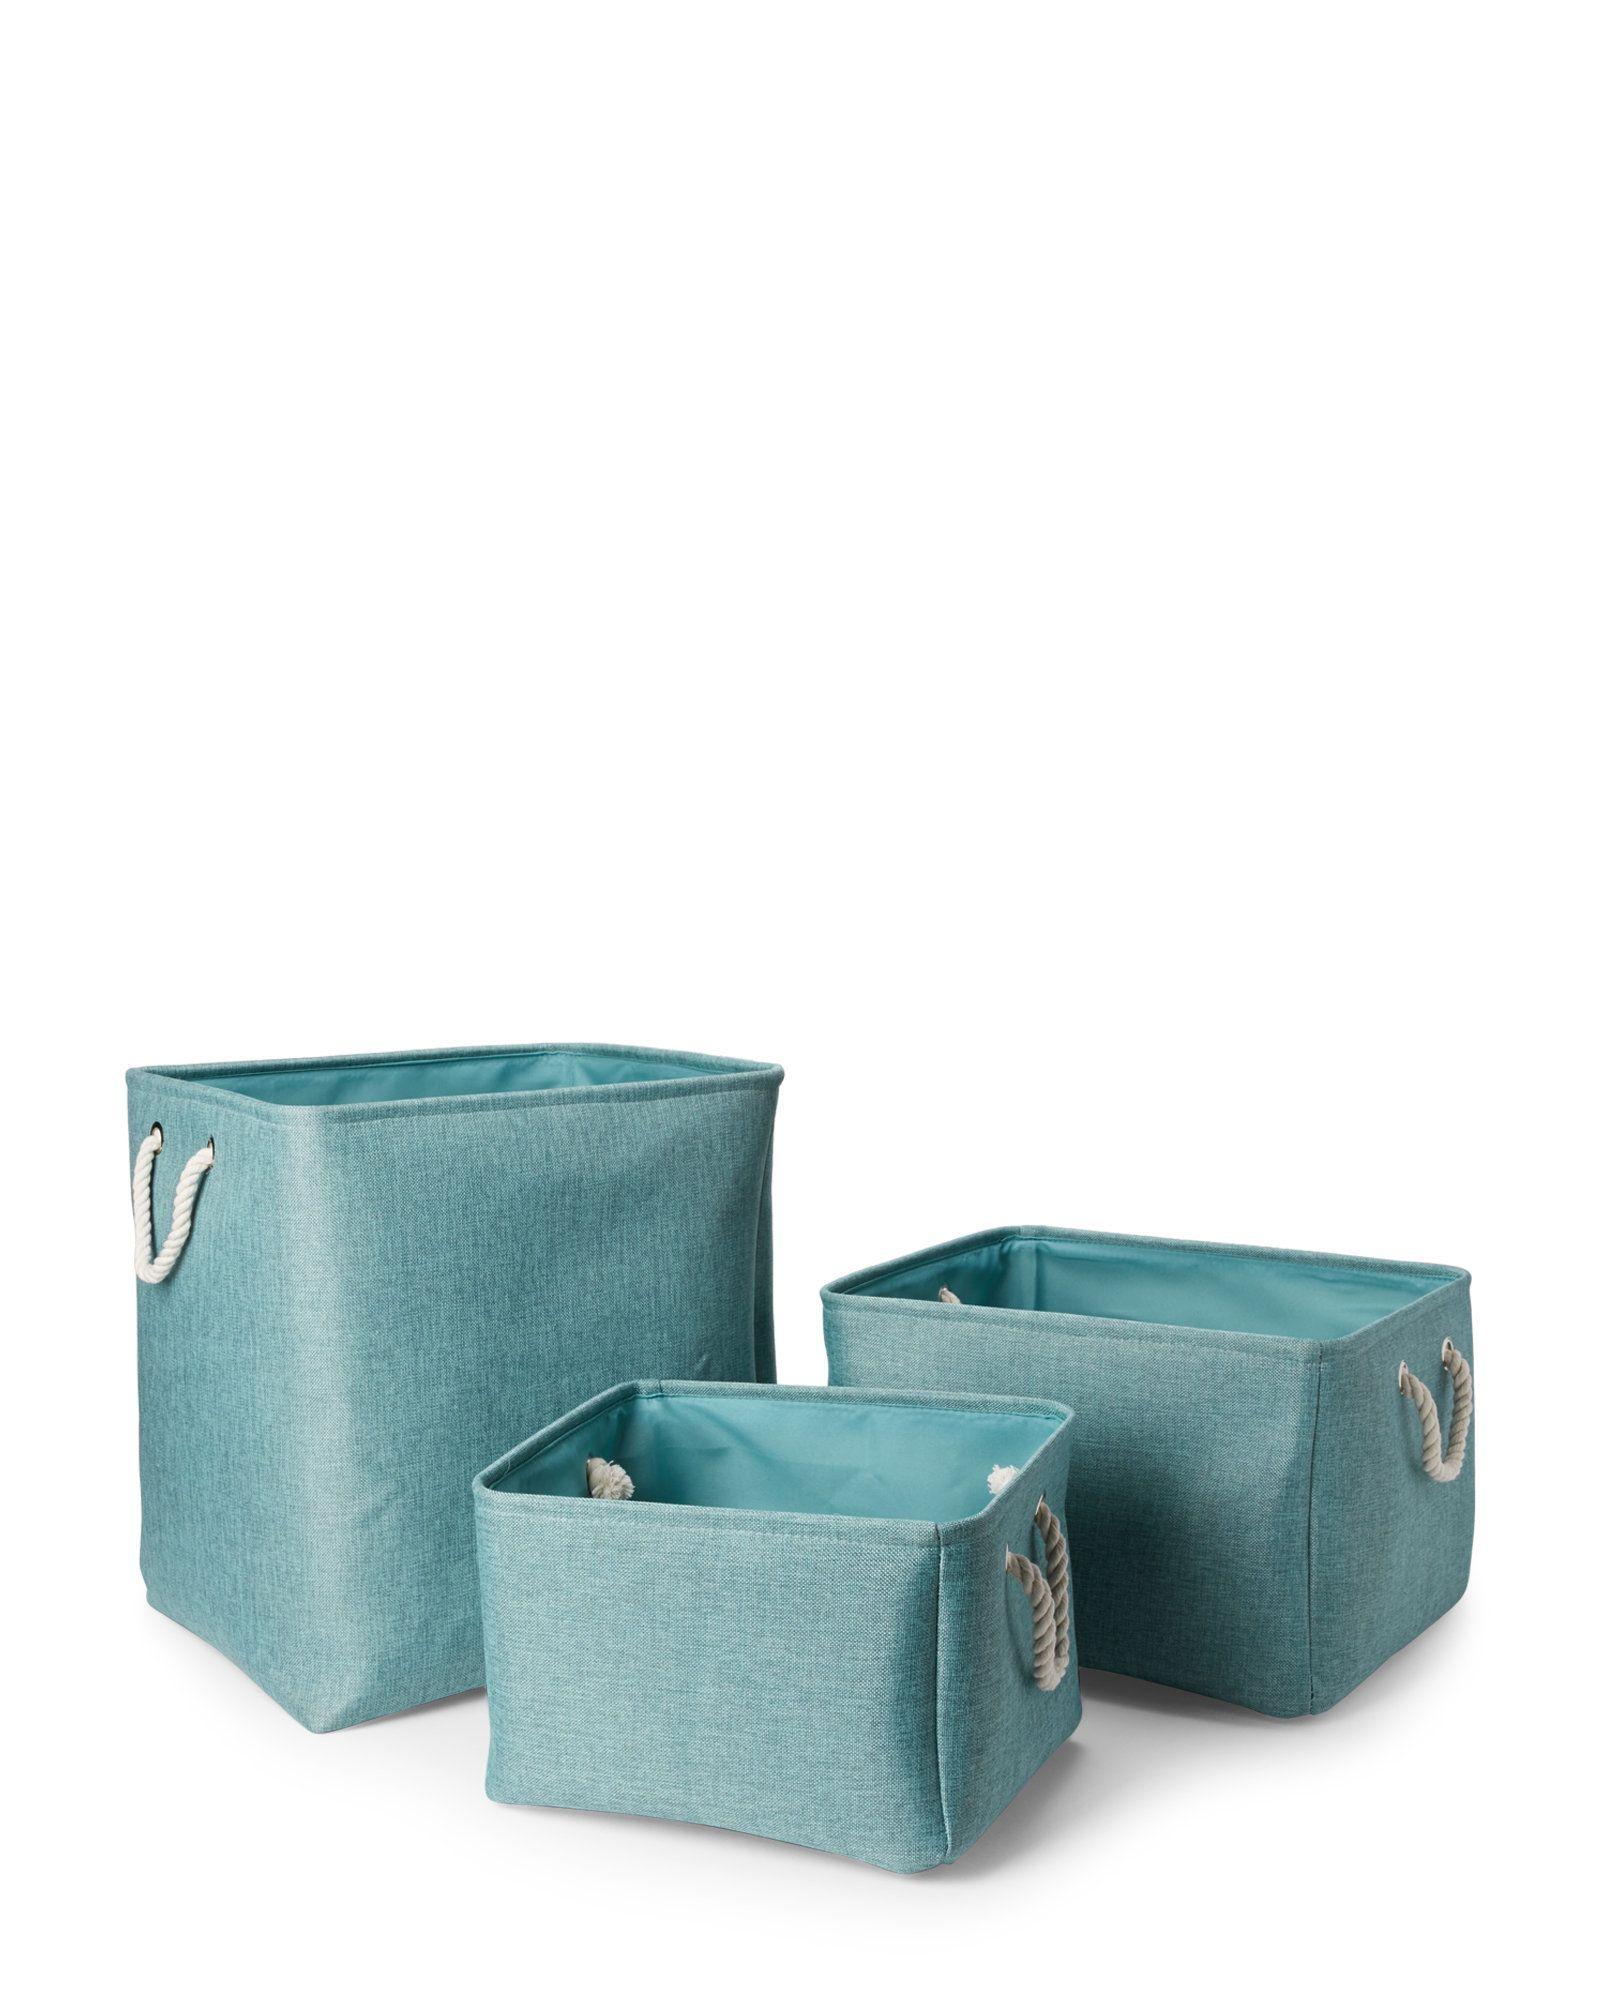 Kenton Grey Melange Jute Storage Bin Jute Storage Bin Grey